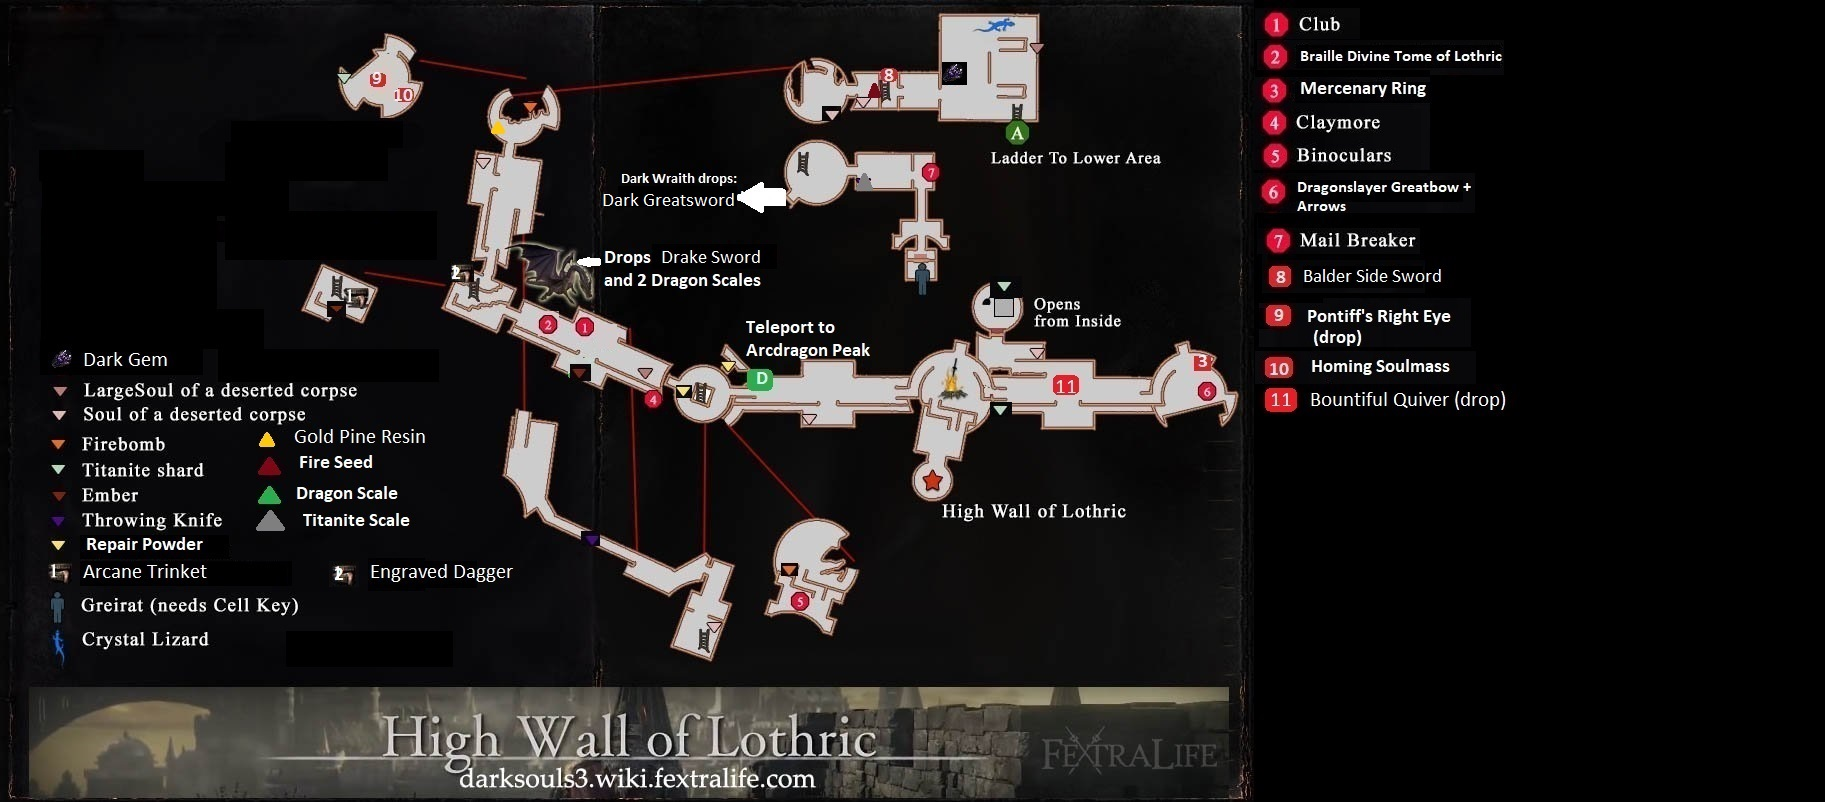 high_wall_of_lothric_map1.jpg